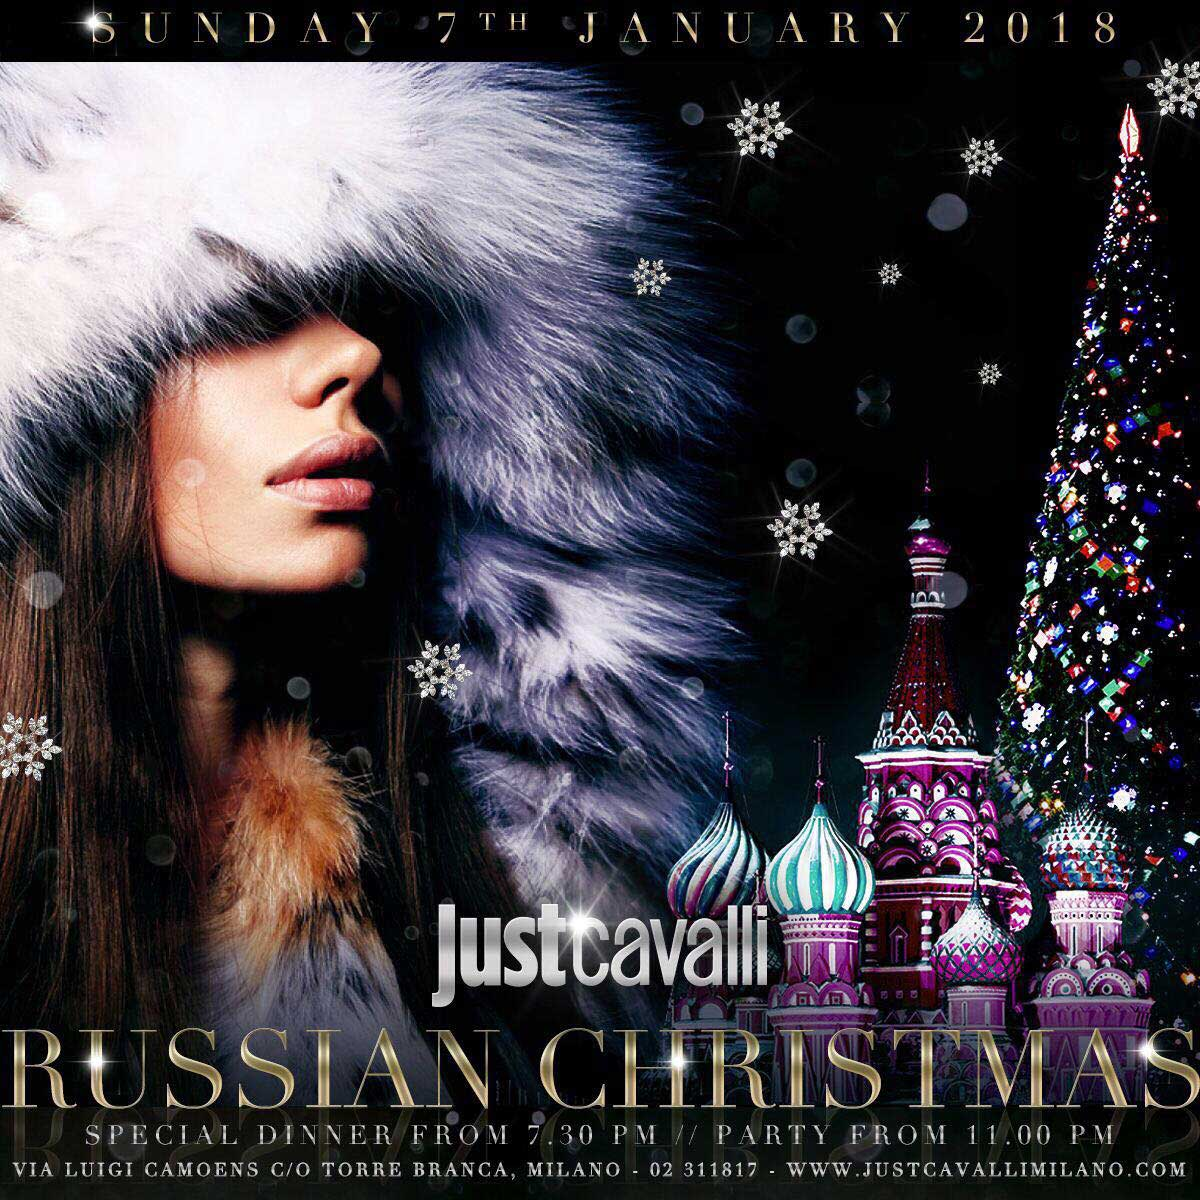 Foto: Russian Christmas Just Cavalli Milano